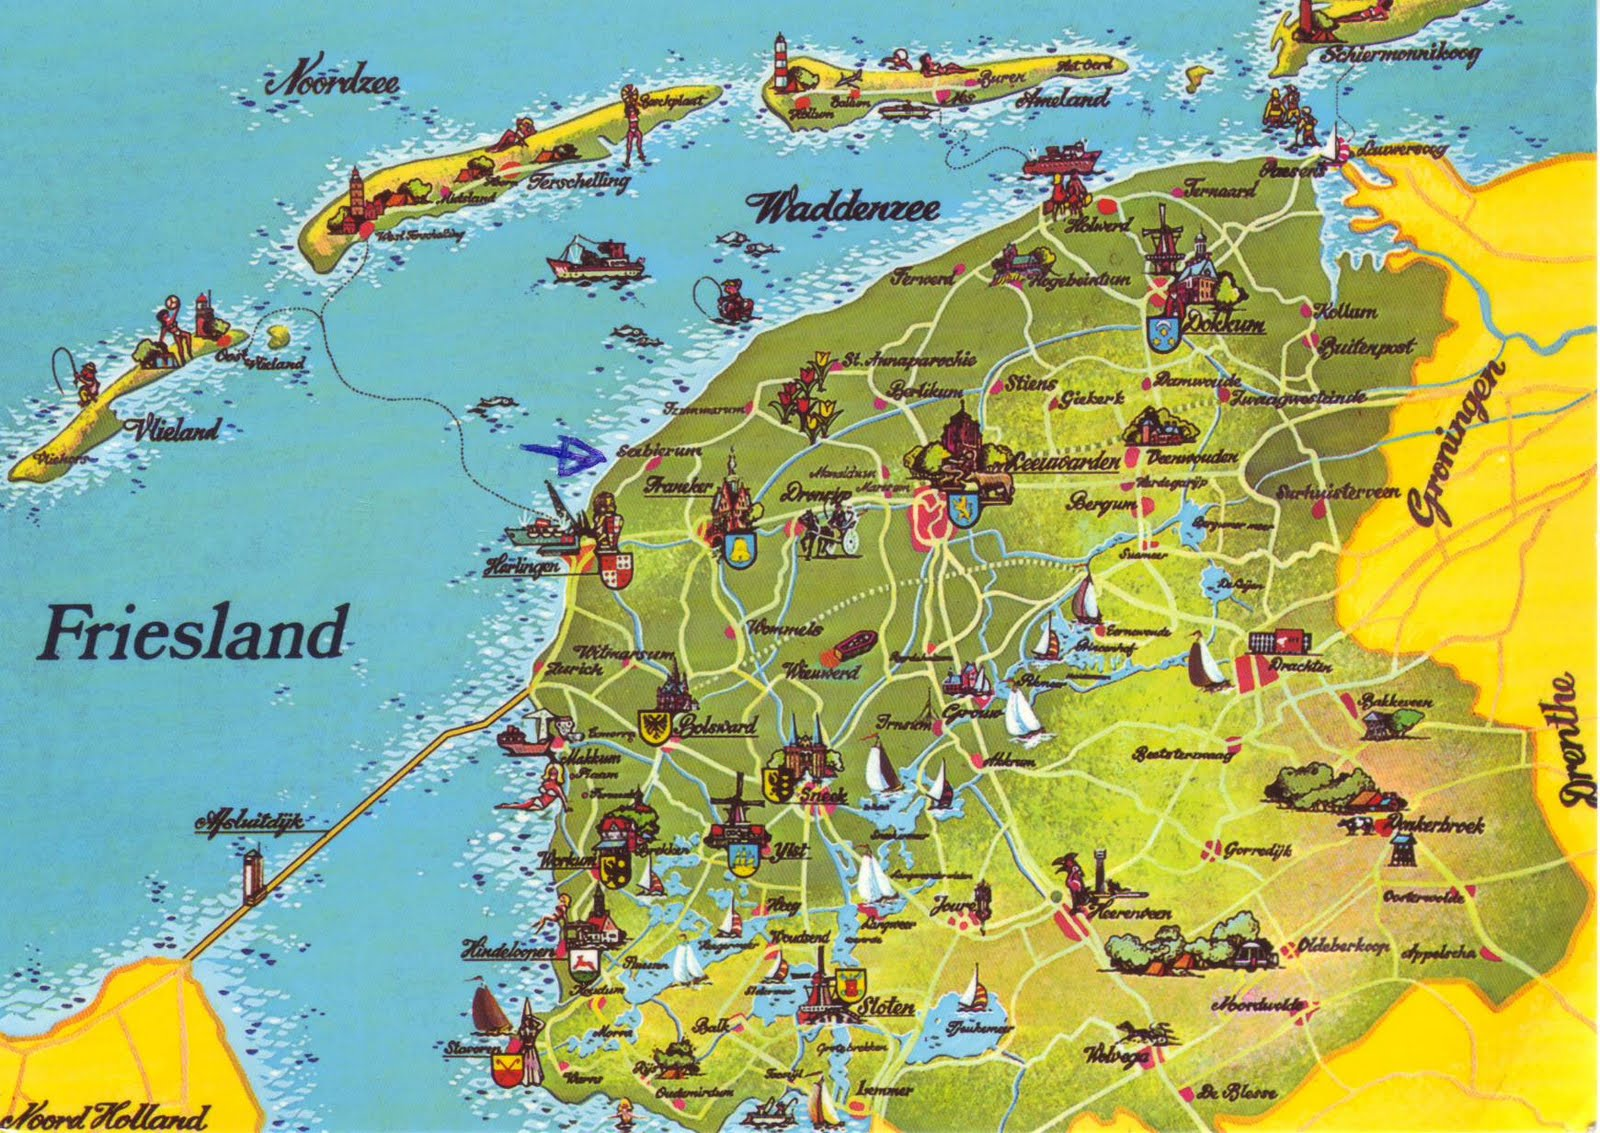 The World in Postcards - Sabine's Blog: Friesland Mapcard ...